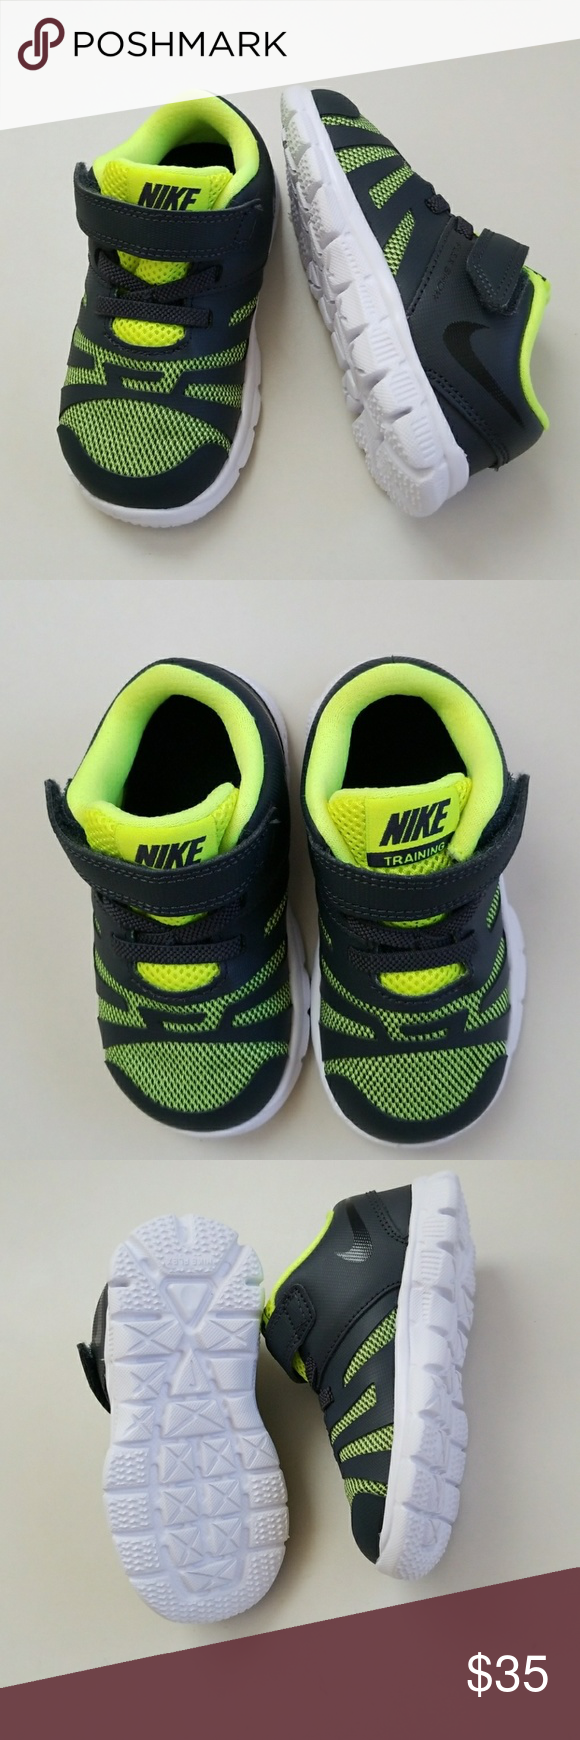 NWT Toddler Nike Training Shoes